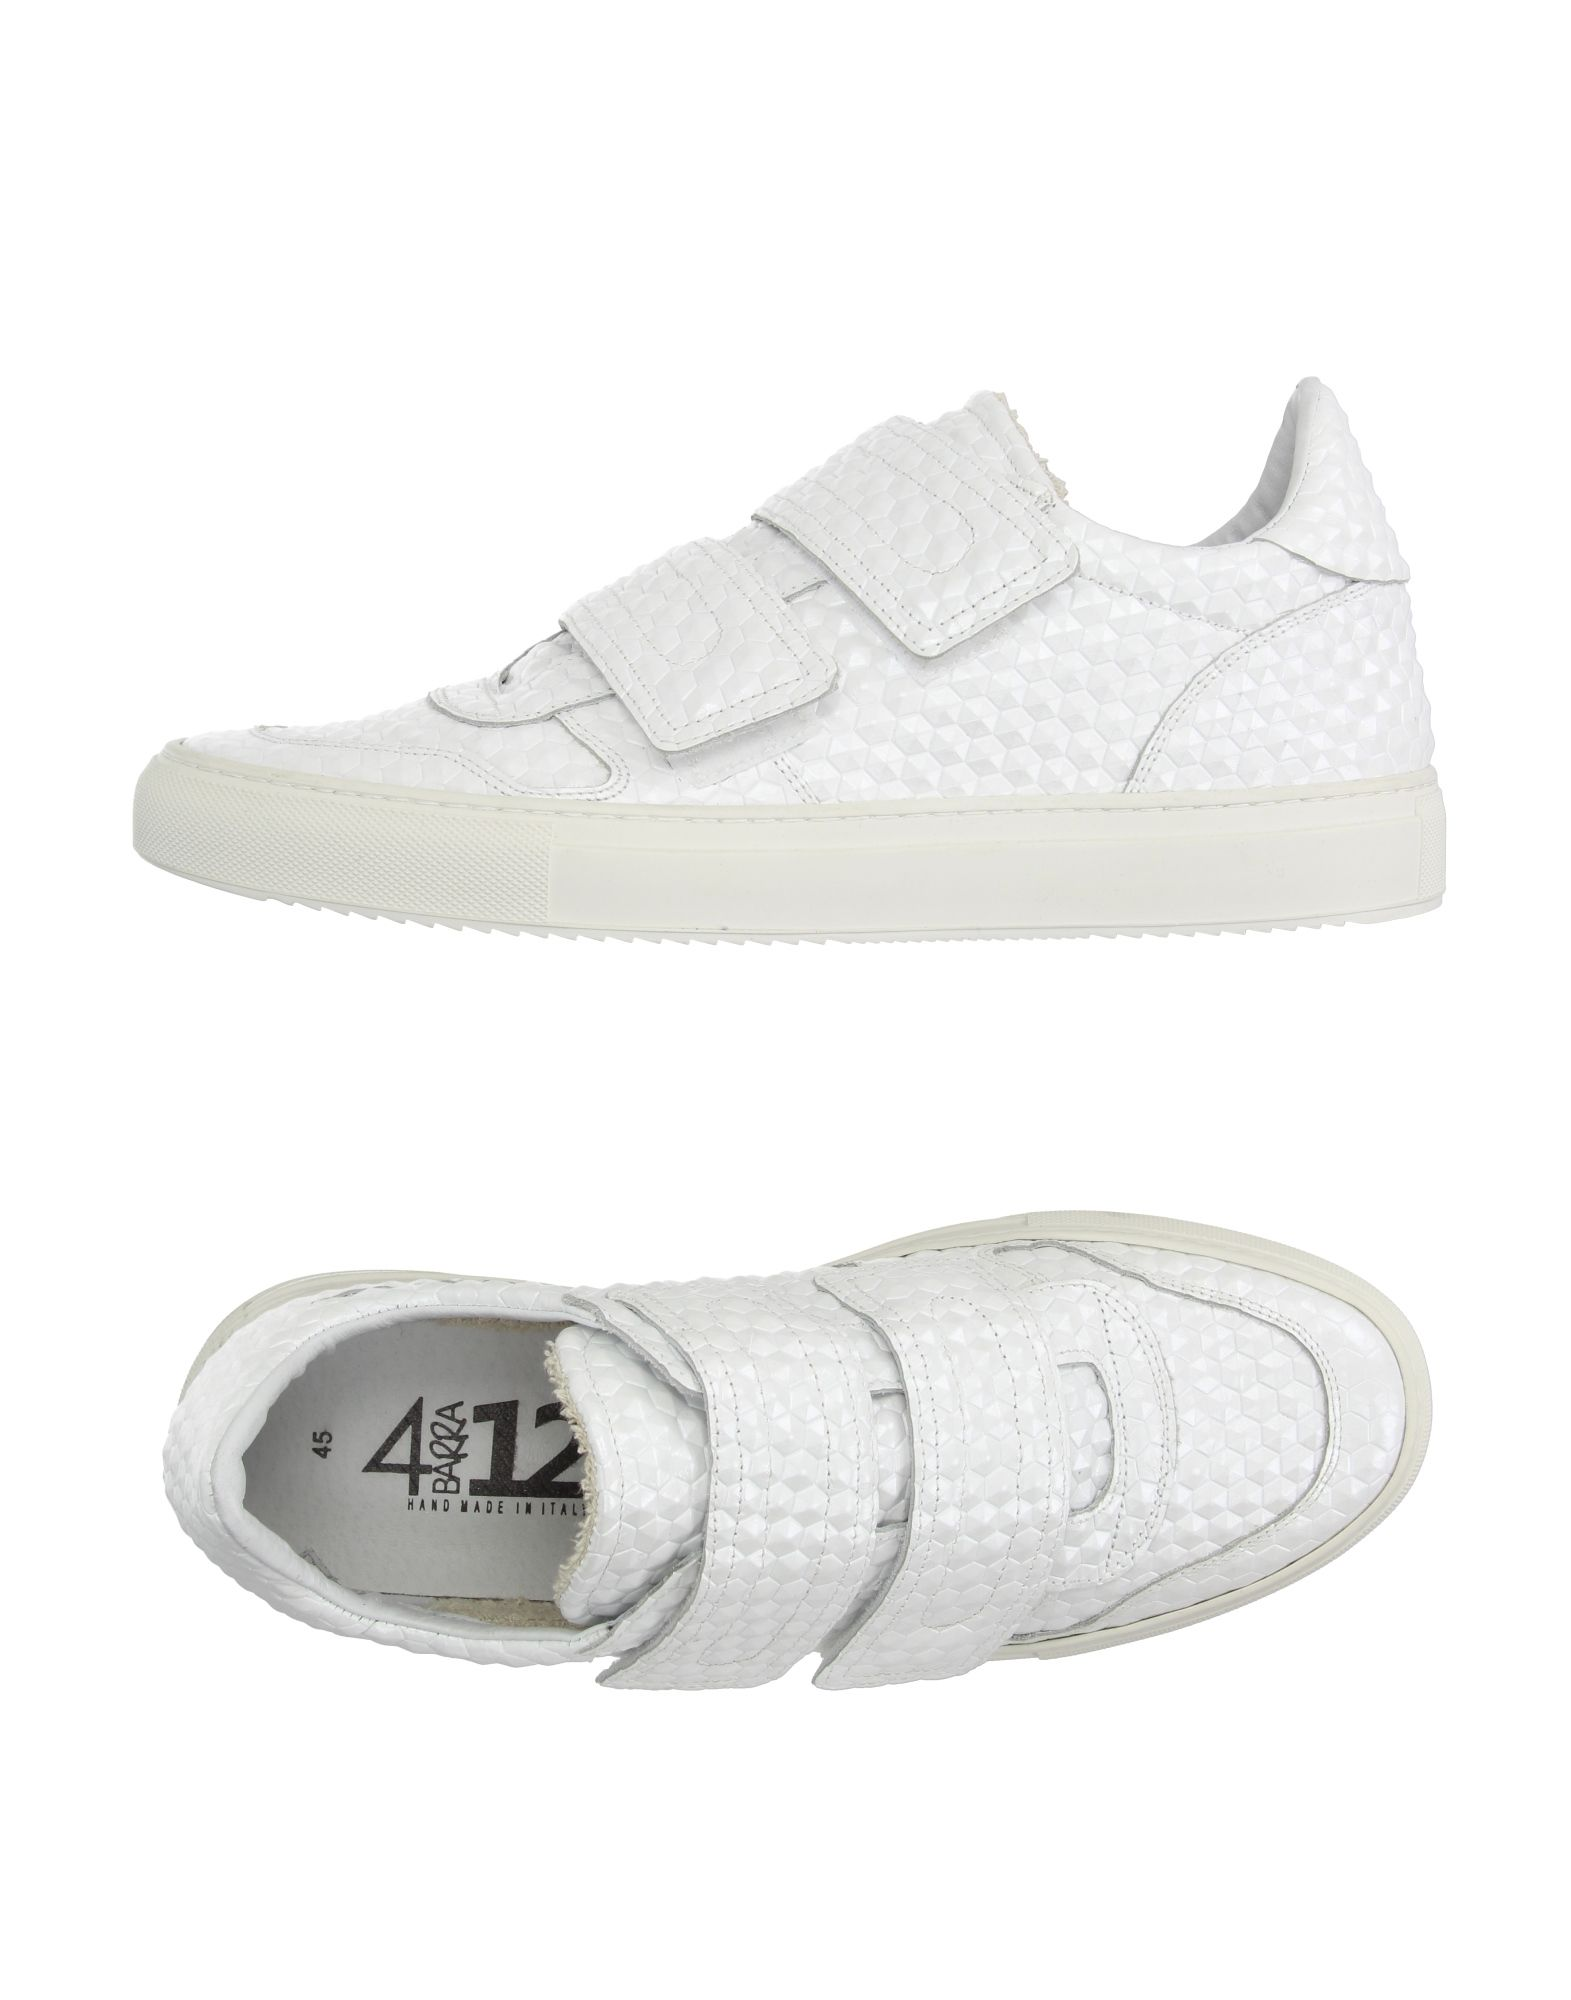 Quattrobarradodici Sneakers Herren  11181949KA Gute Qualität beliebte Schuhe